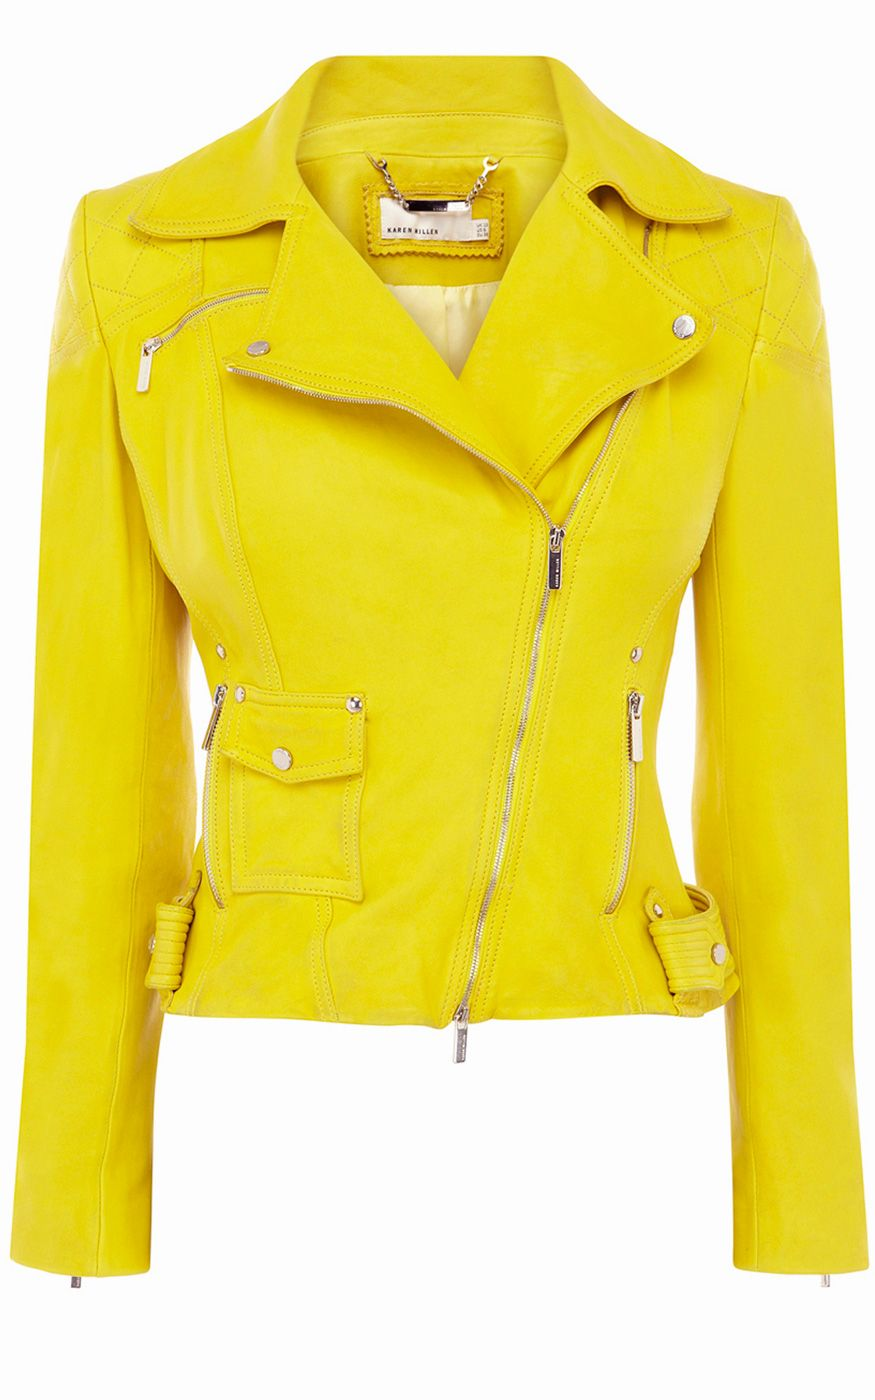 81b50ce94 Limited edition leather jacket | Karen Millen (JQ080) | JUST SOME ...